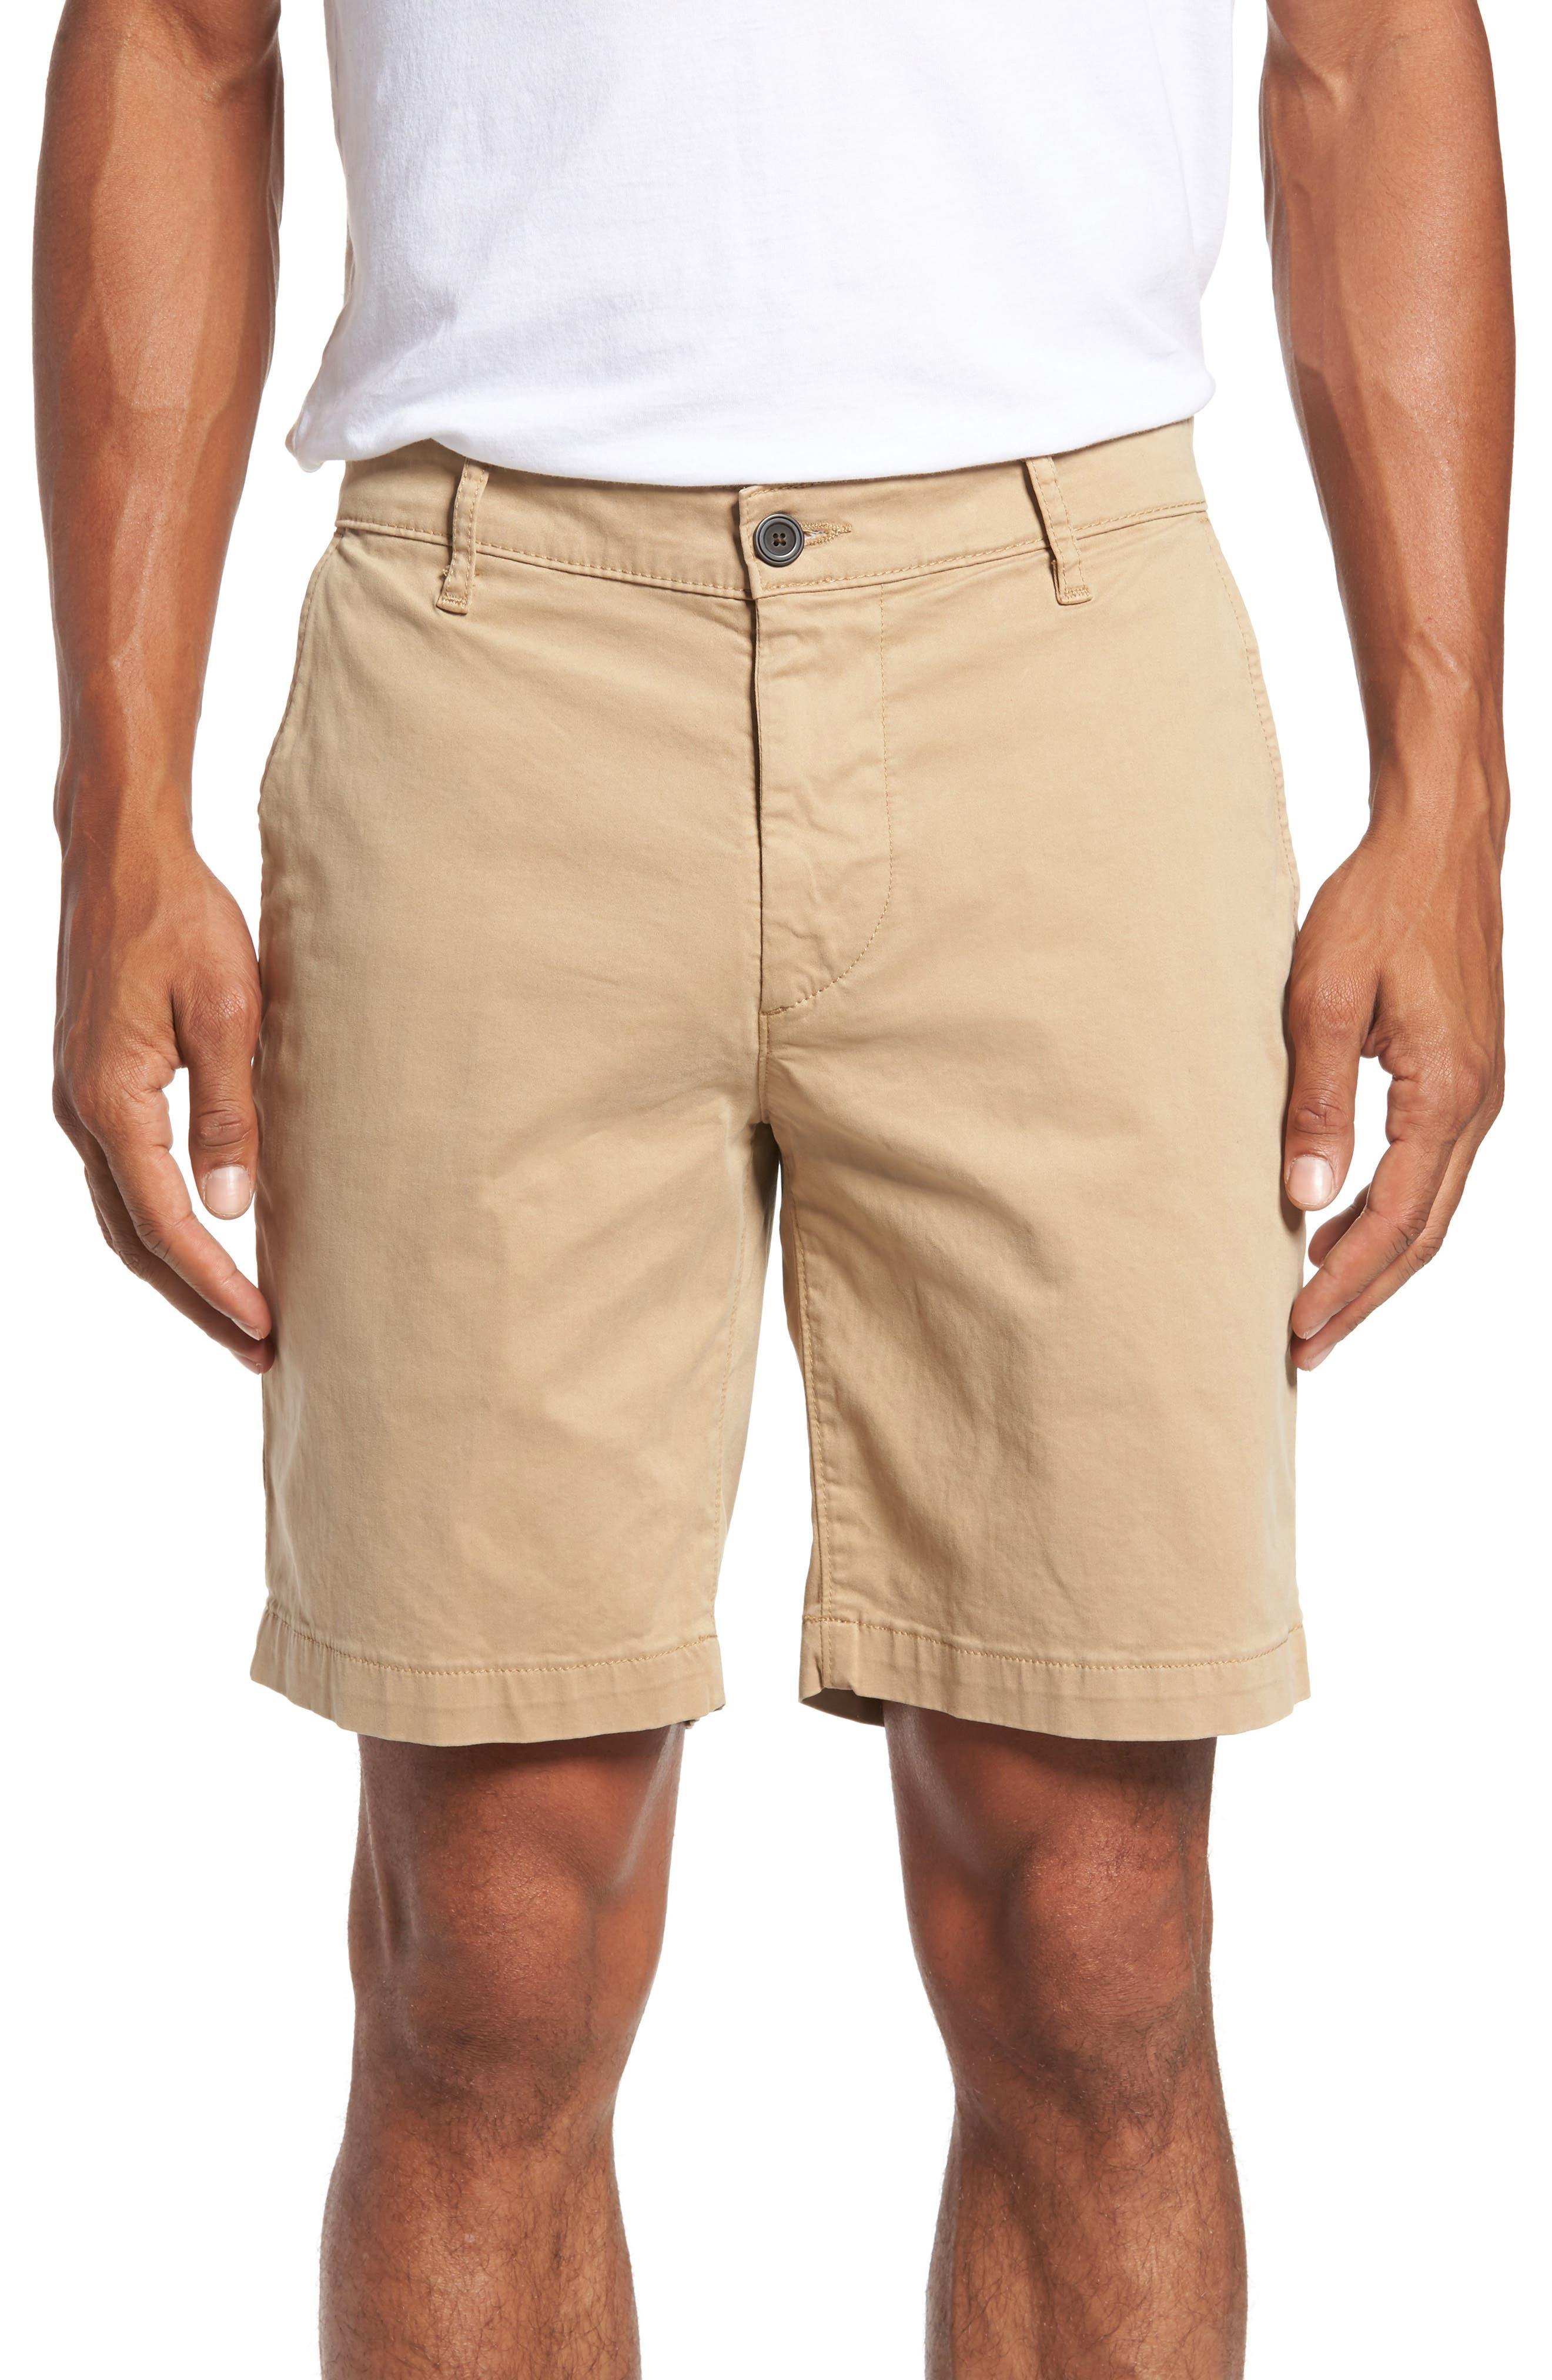 Wanderer Modern Slim Fit Shorts,                             Main thumbnail 1, color,                             244